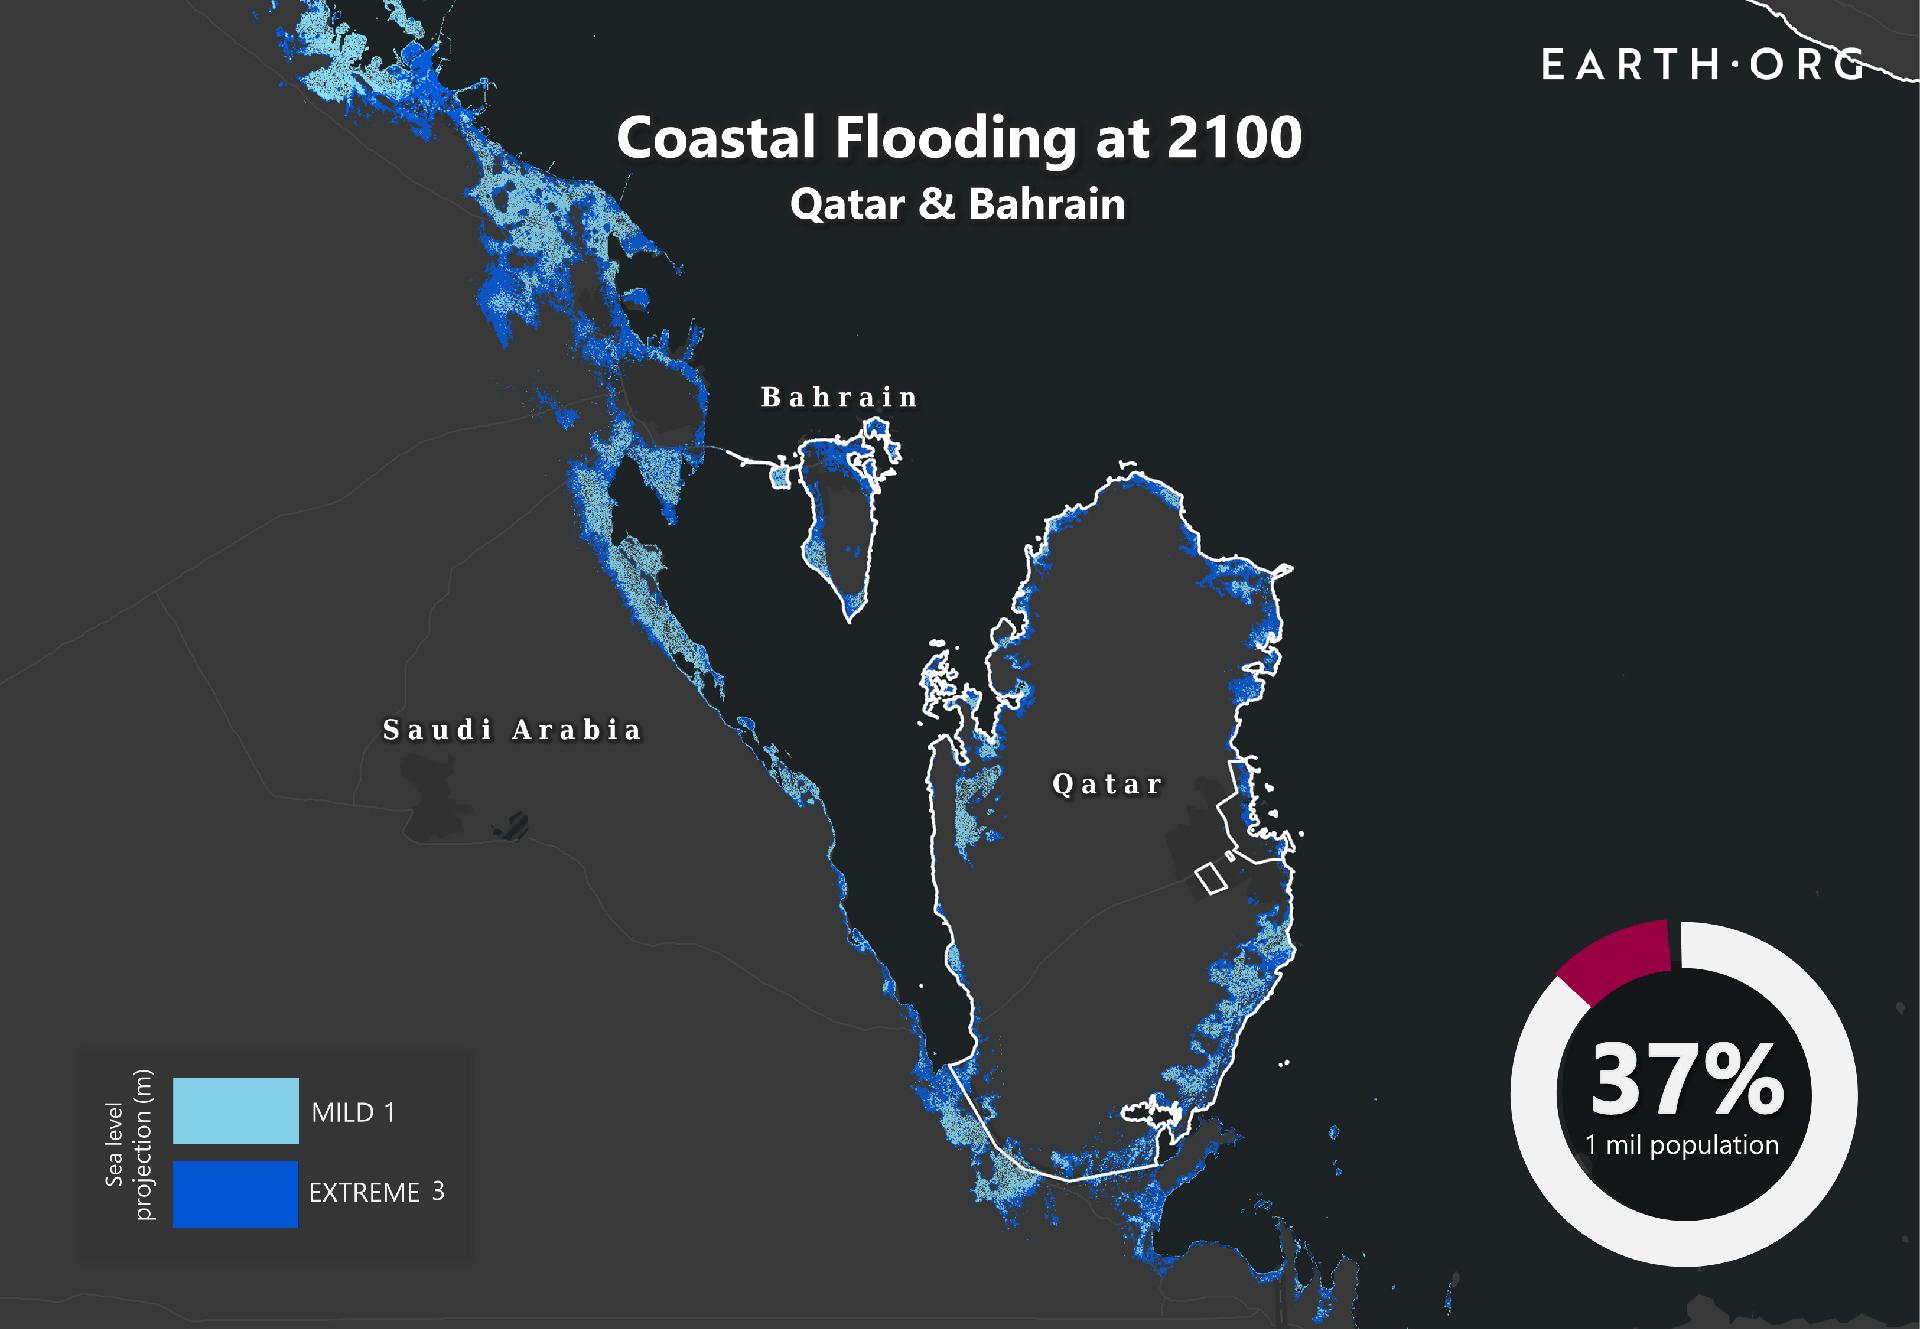 sea level rise Qatar and Bahrain 2100 end of century